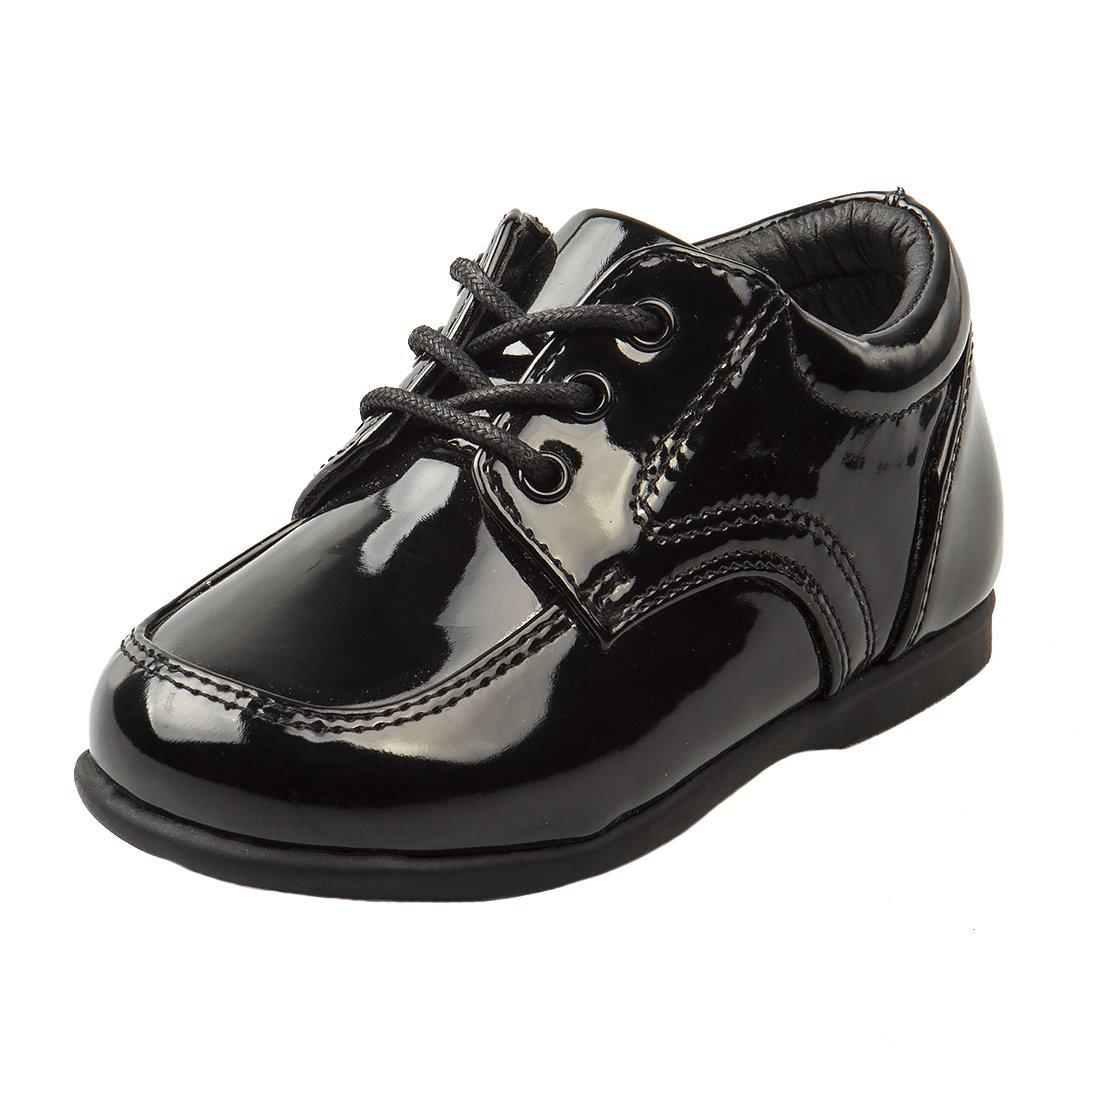 a53d2b018 toddler girls black dress shoes – Little Black Dress | Black Lace ...